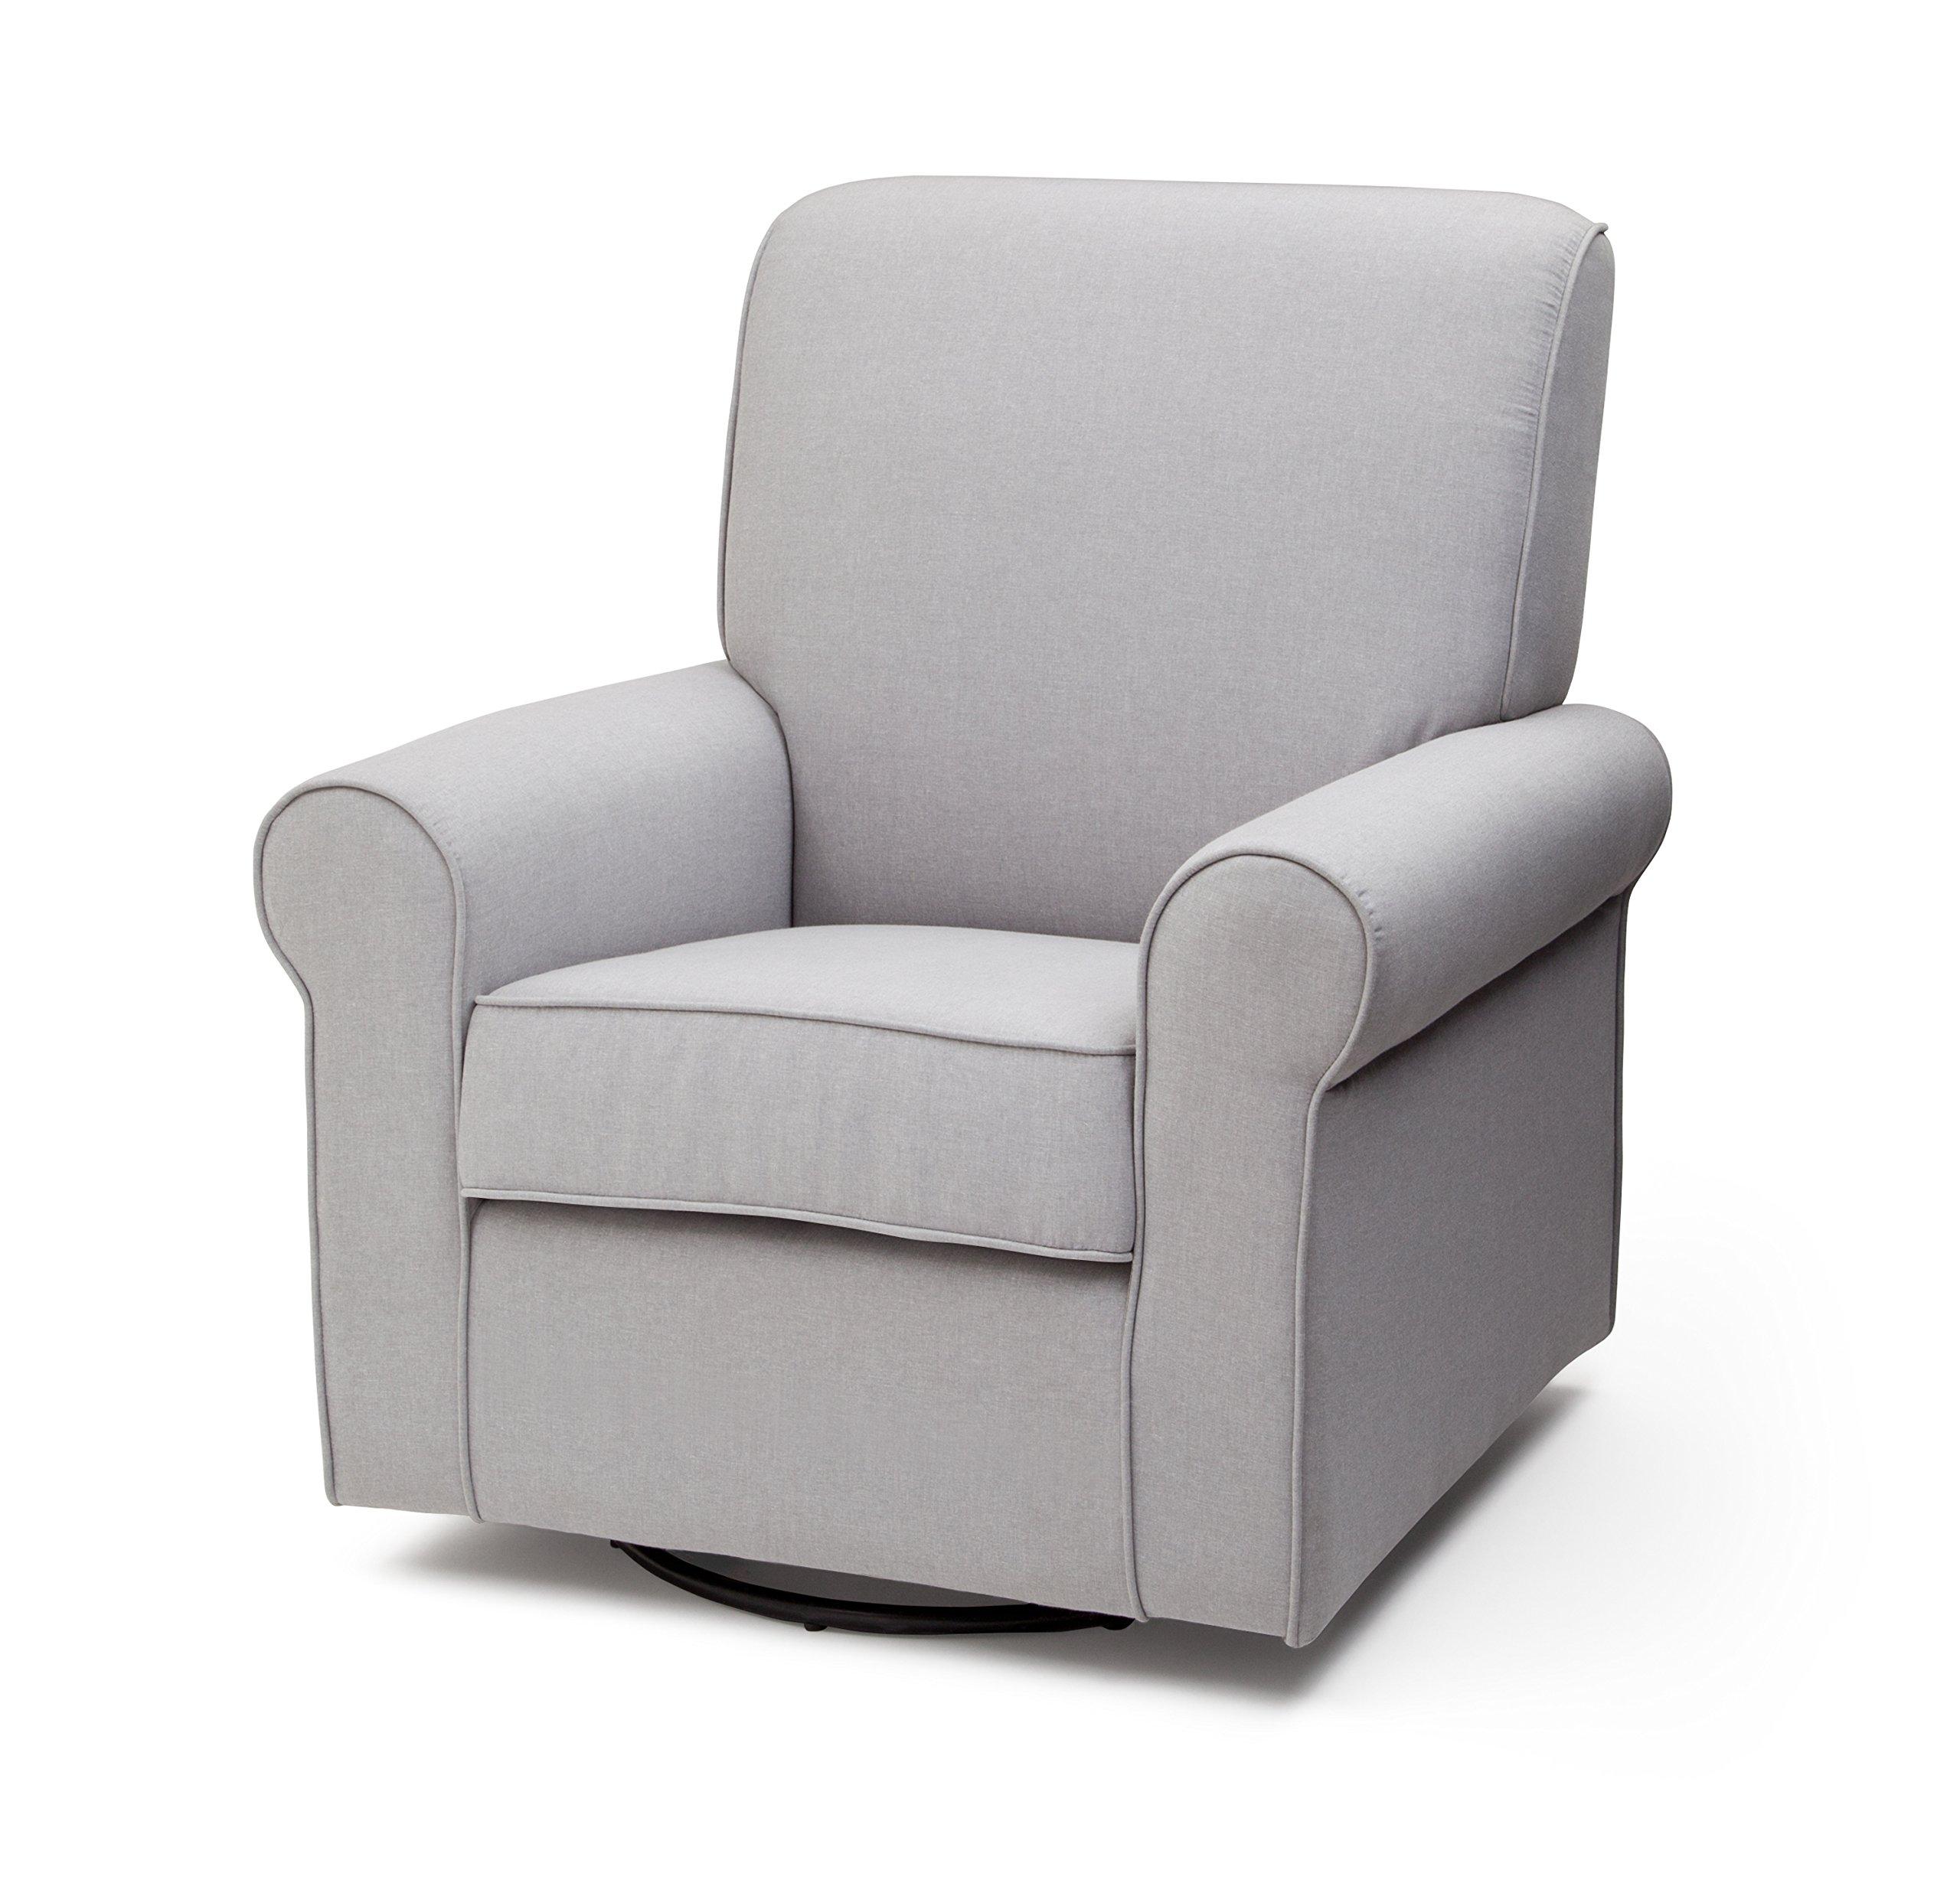 Delta Furniture Avery Upholstered Glider Swivel Rocker Chair, Heather Grey